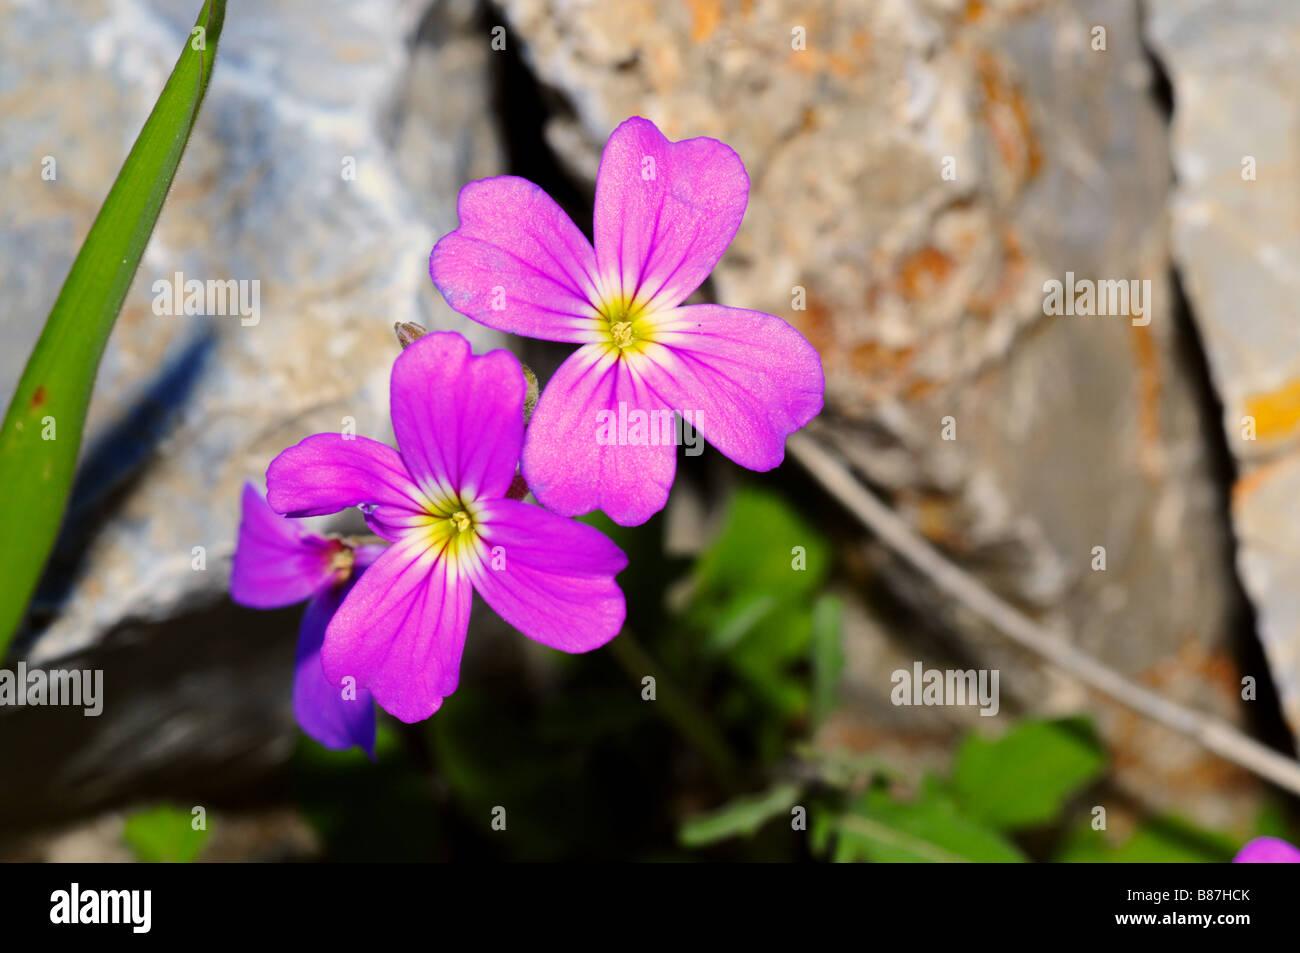 Flowers Pink Wildflowers Greece Stock Photos Flowers Pink